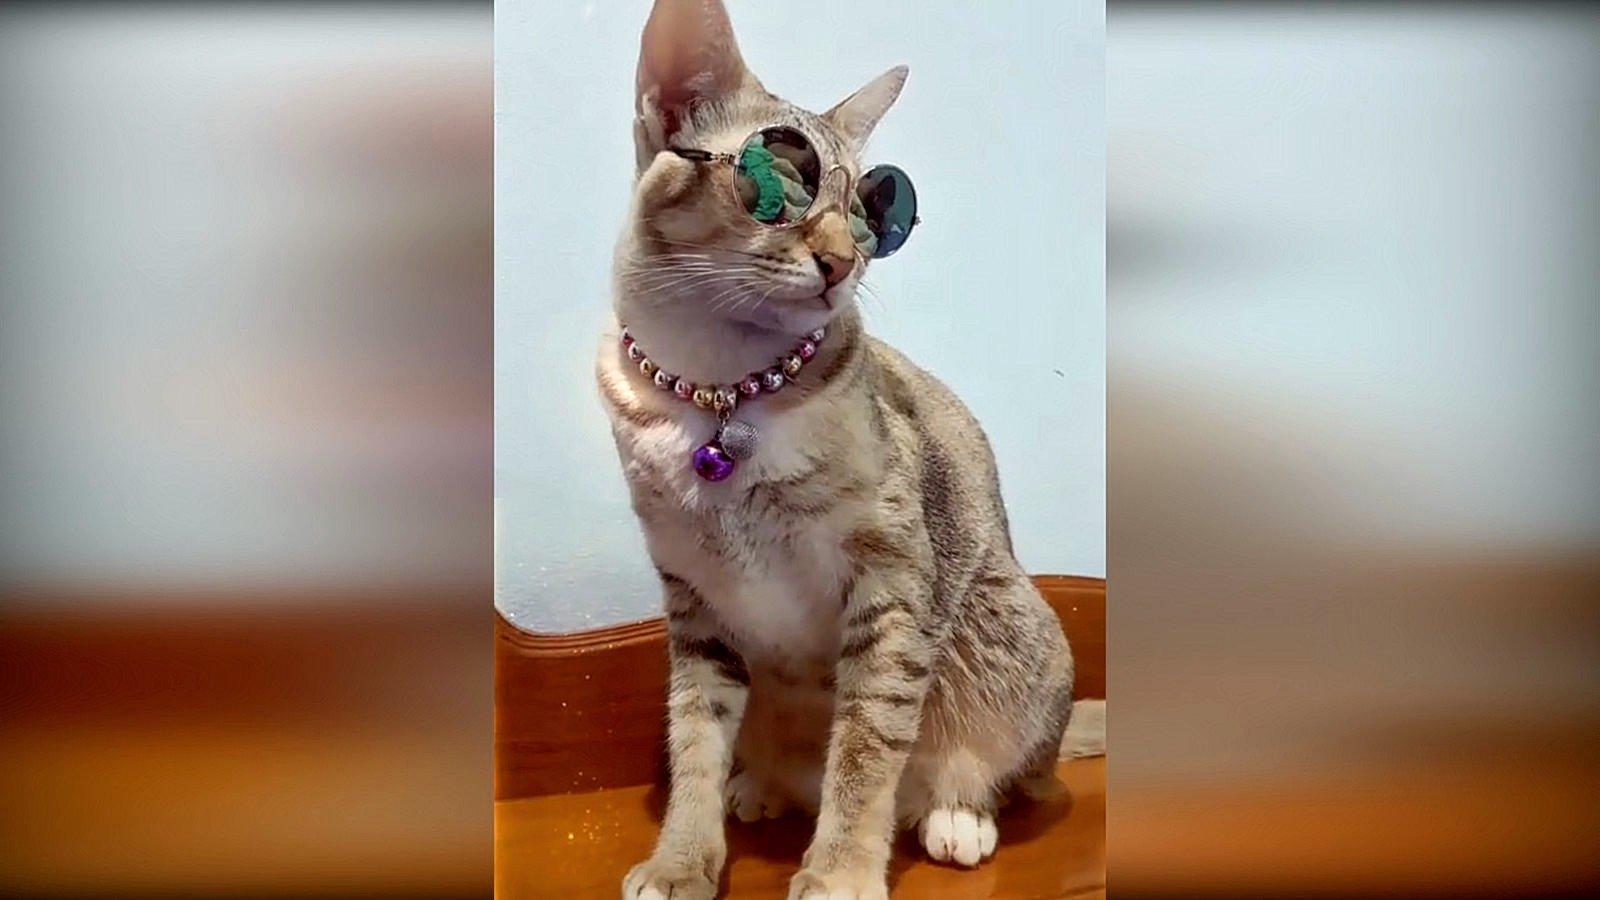 Приколы про котов до слез 2017 картинки, месяц